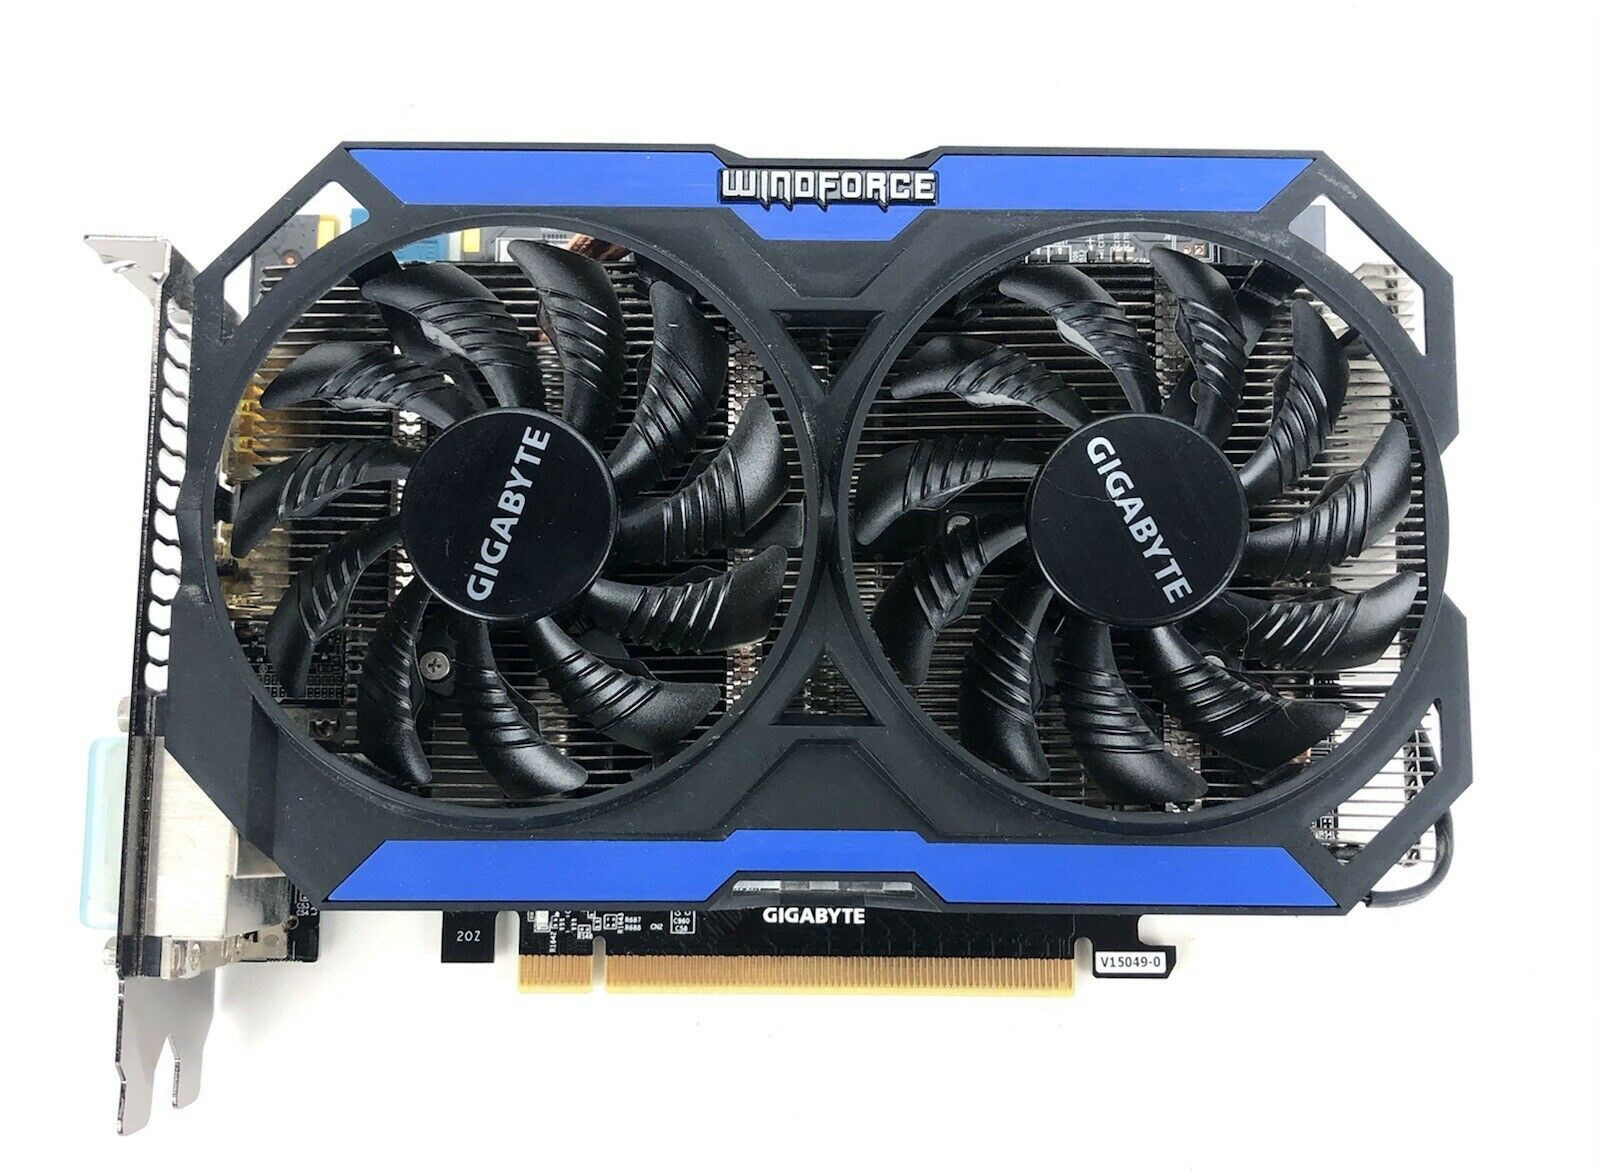 GIGABYTE Windforce GeForce GTX 960 2GB GDDR5 #GV-N960OC-2GD ITX Graphics Card